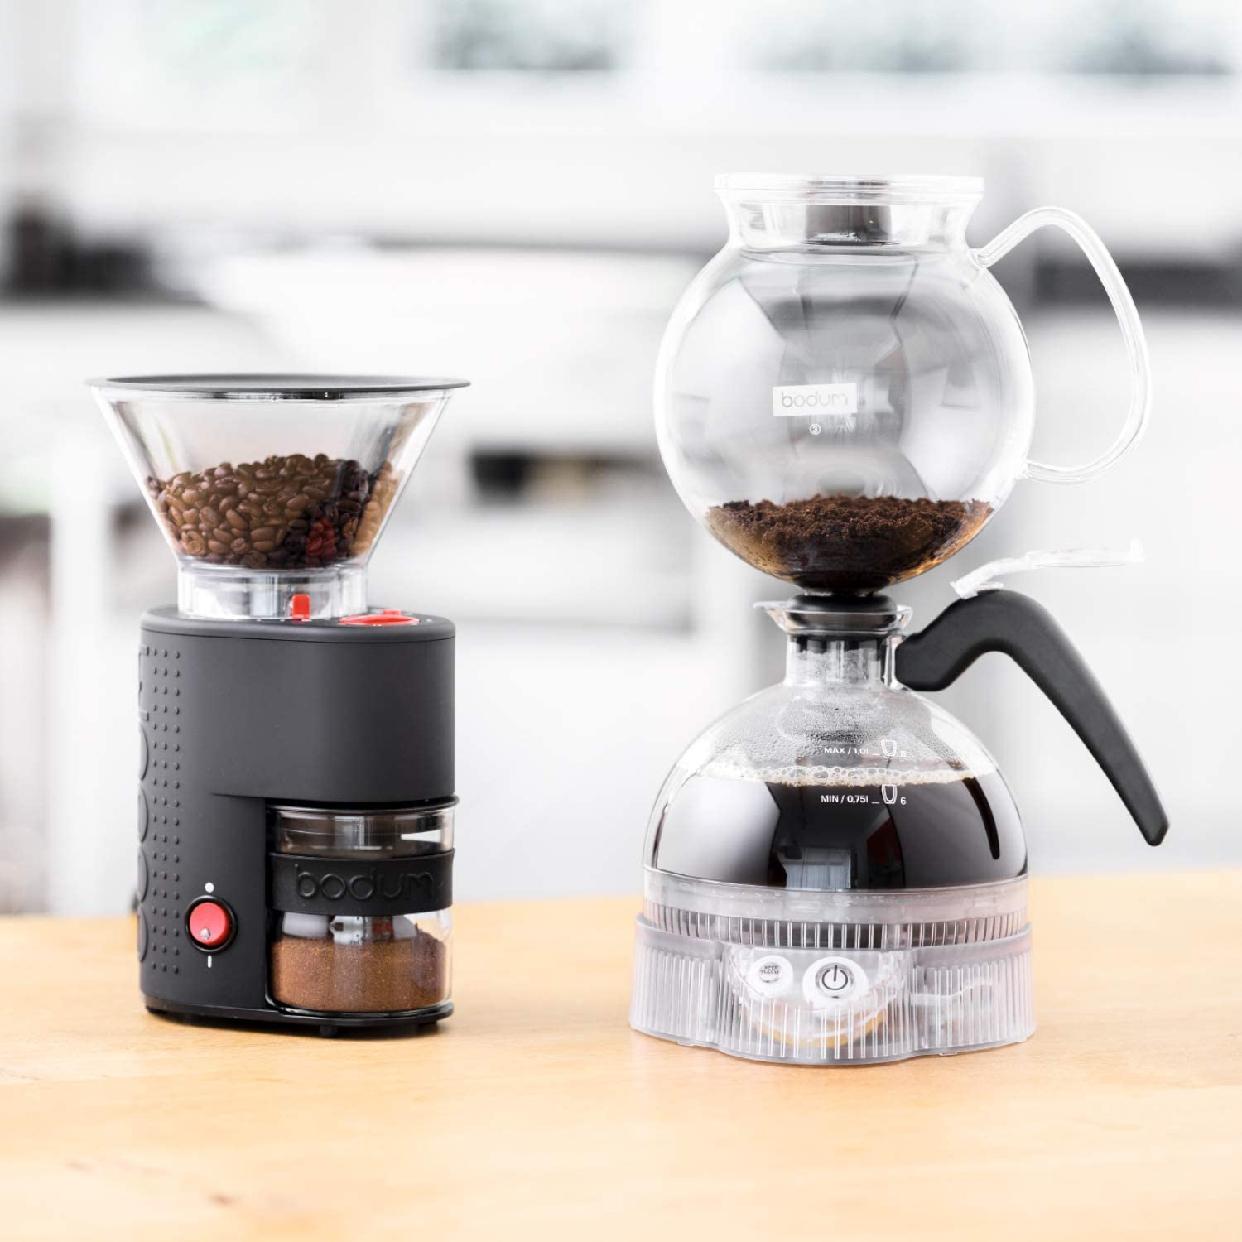 bodum(ボダム) BISTRO コーヒーグラインダー 10903-01JP-3の商品画像7